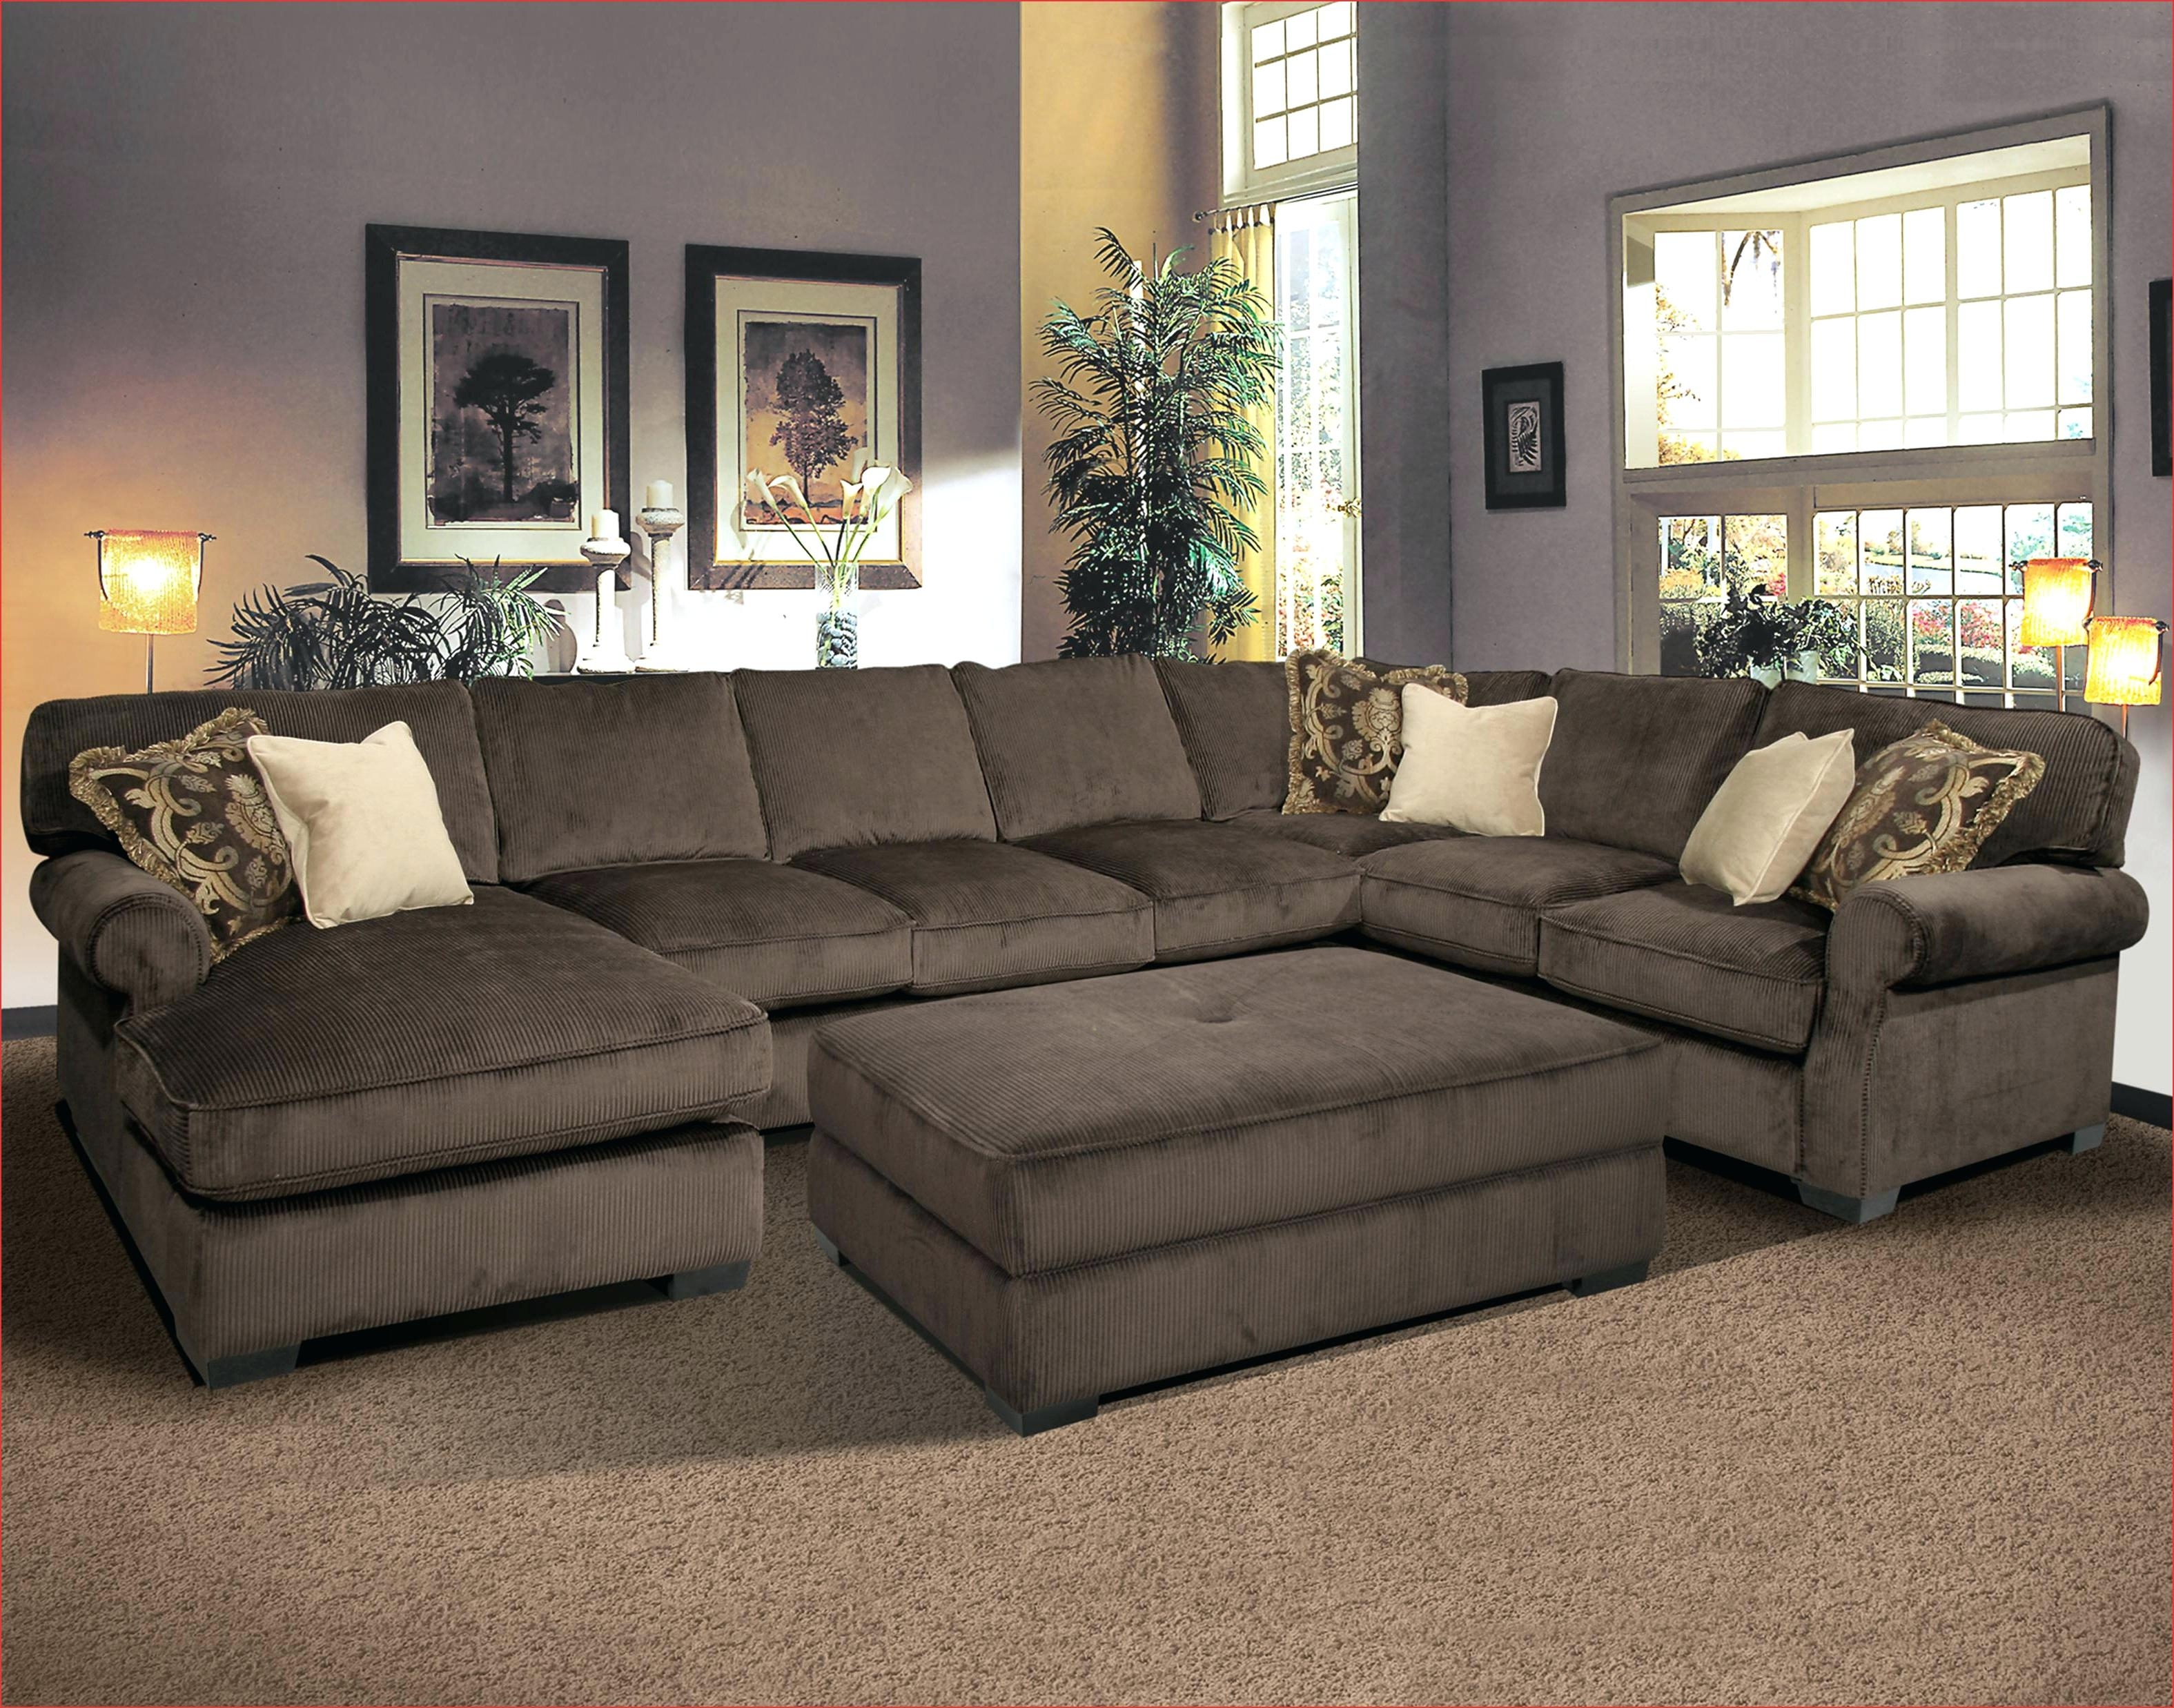 2018 Latest Orange County Ca Sectional Sofas Sofa Ideas